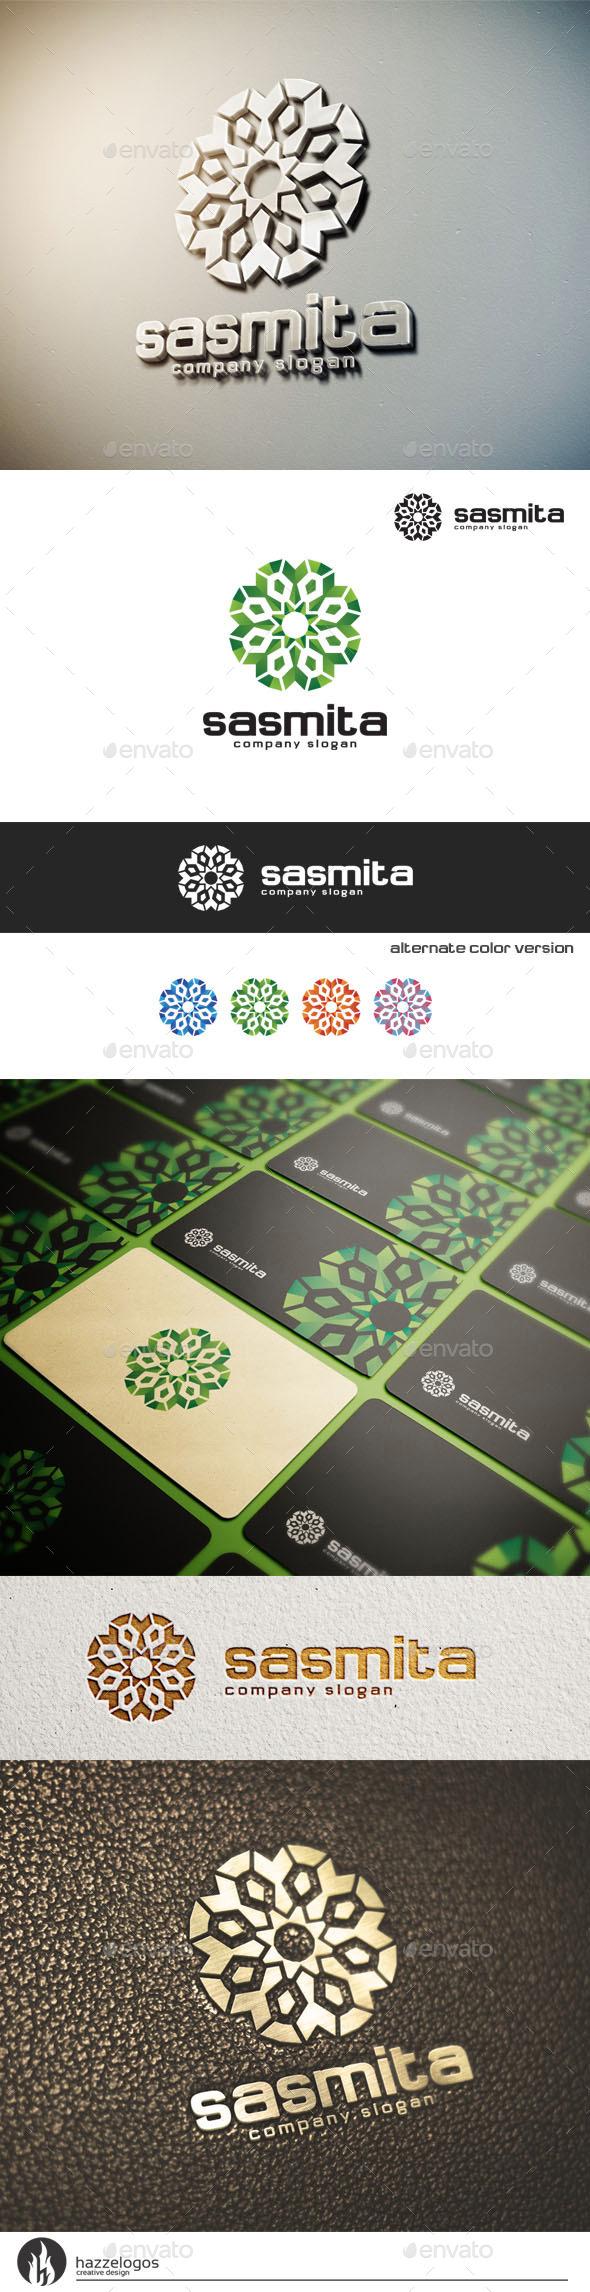 GraphicRiver Sasmita Logo 10670298